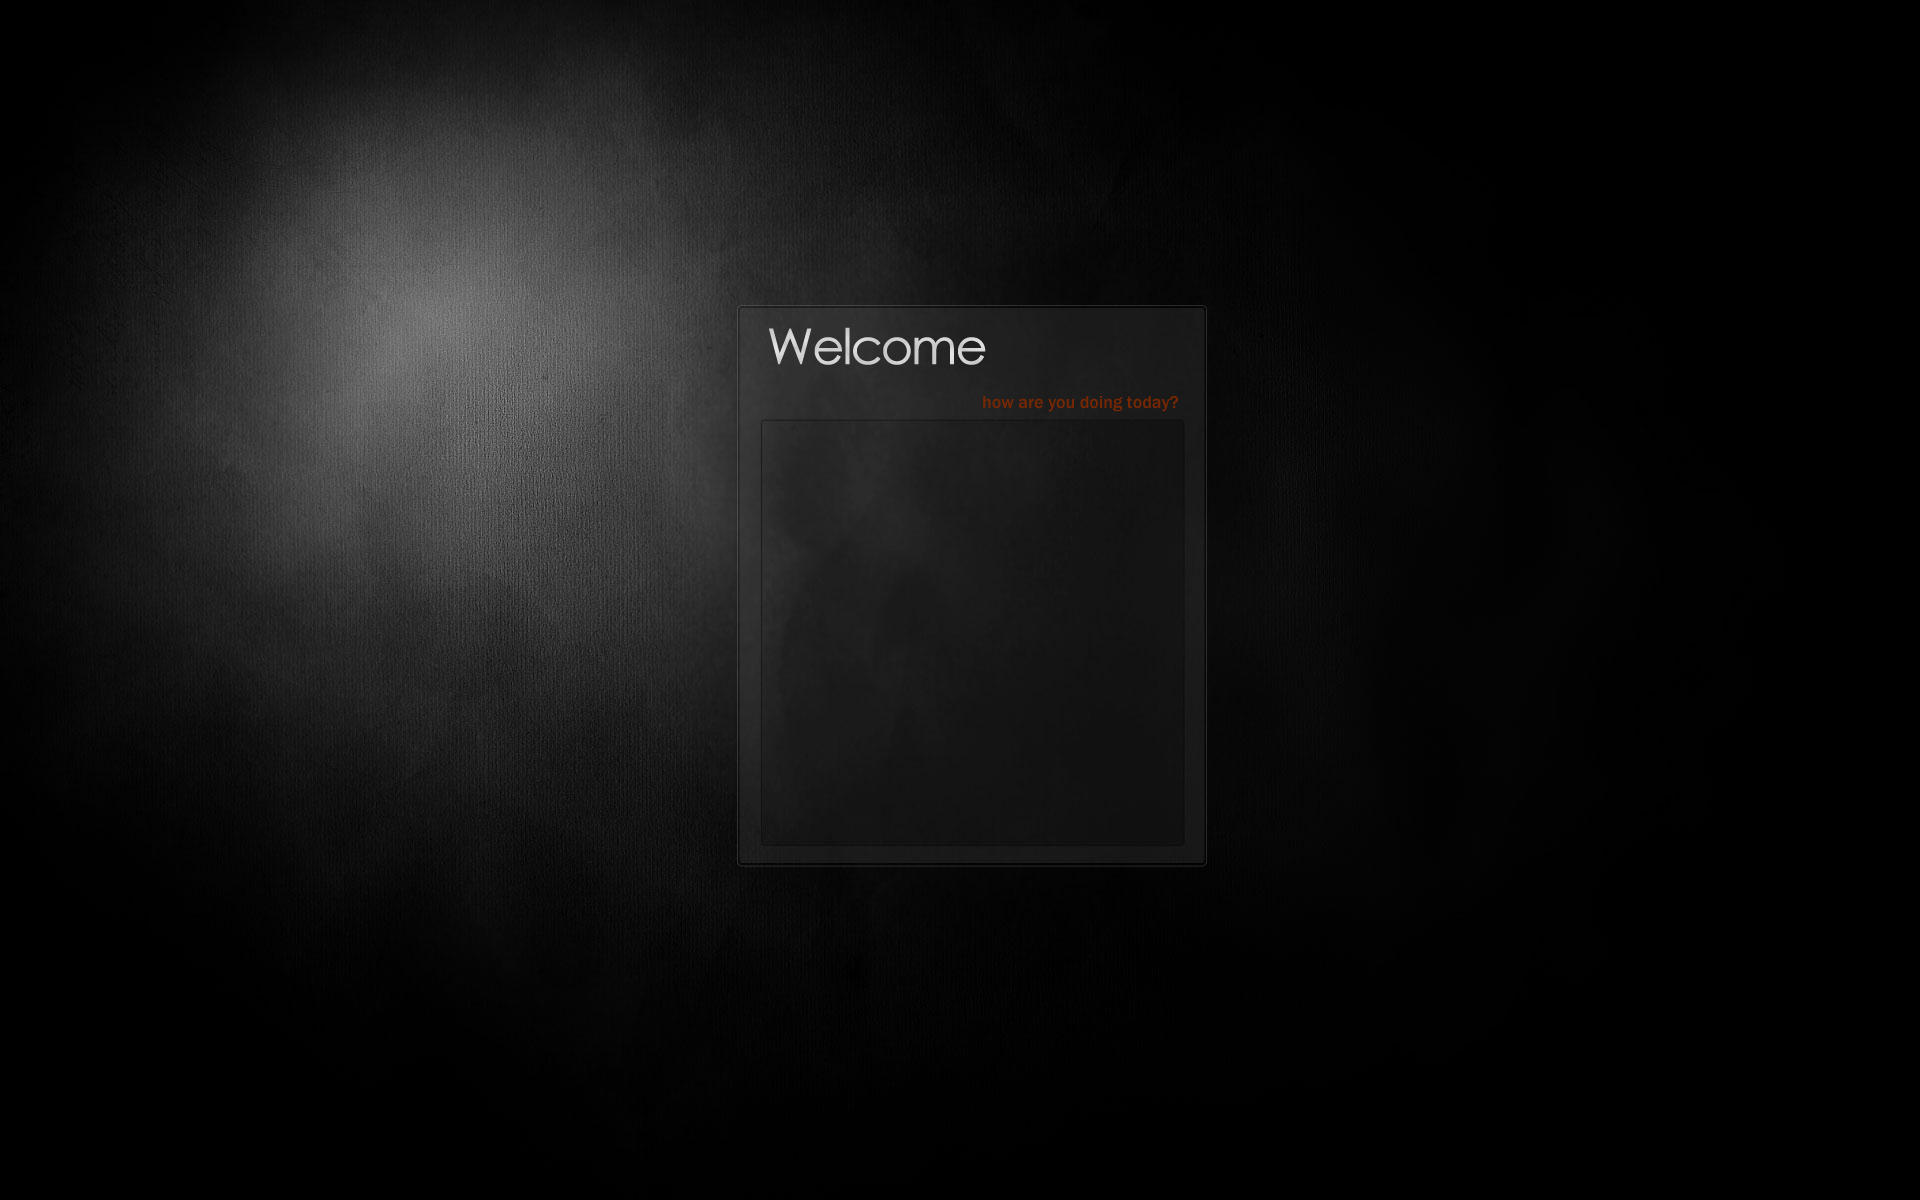 windows 7 logon screen background